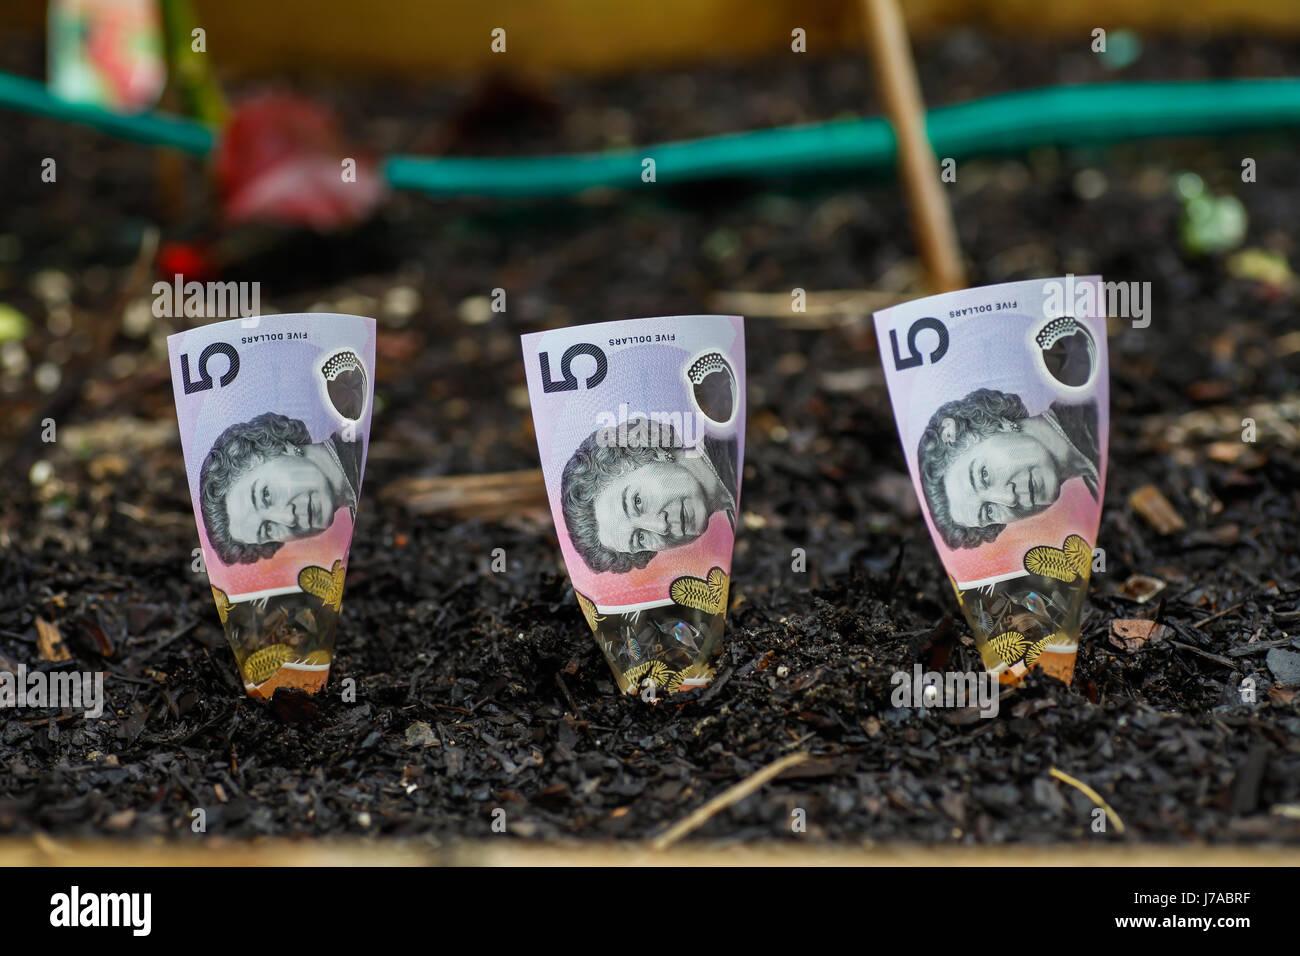 Planting Australian money in Garden Bed - Stock Image